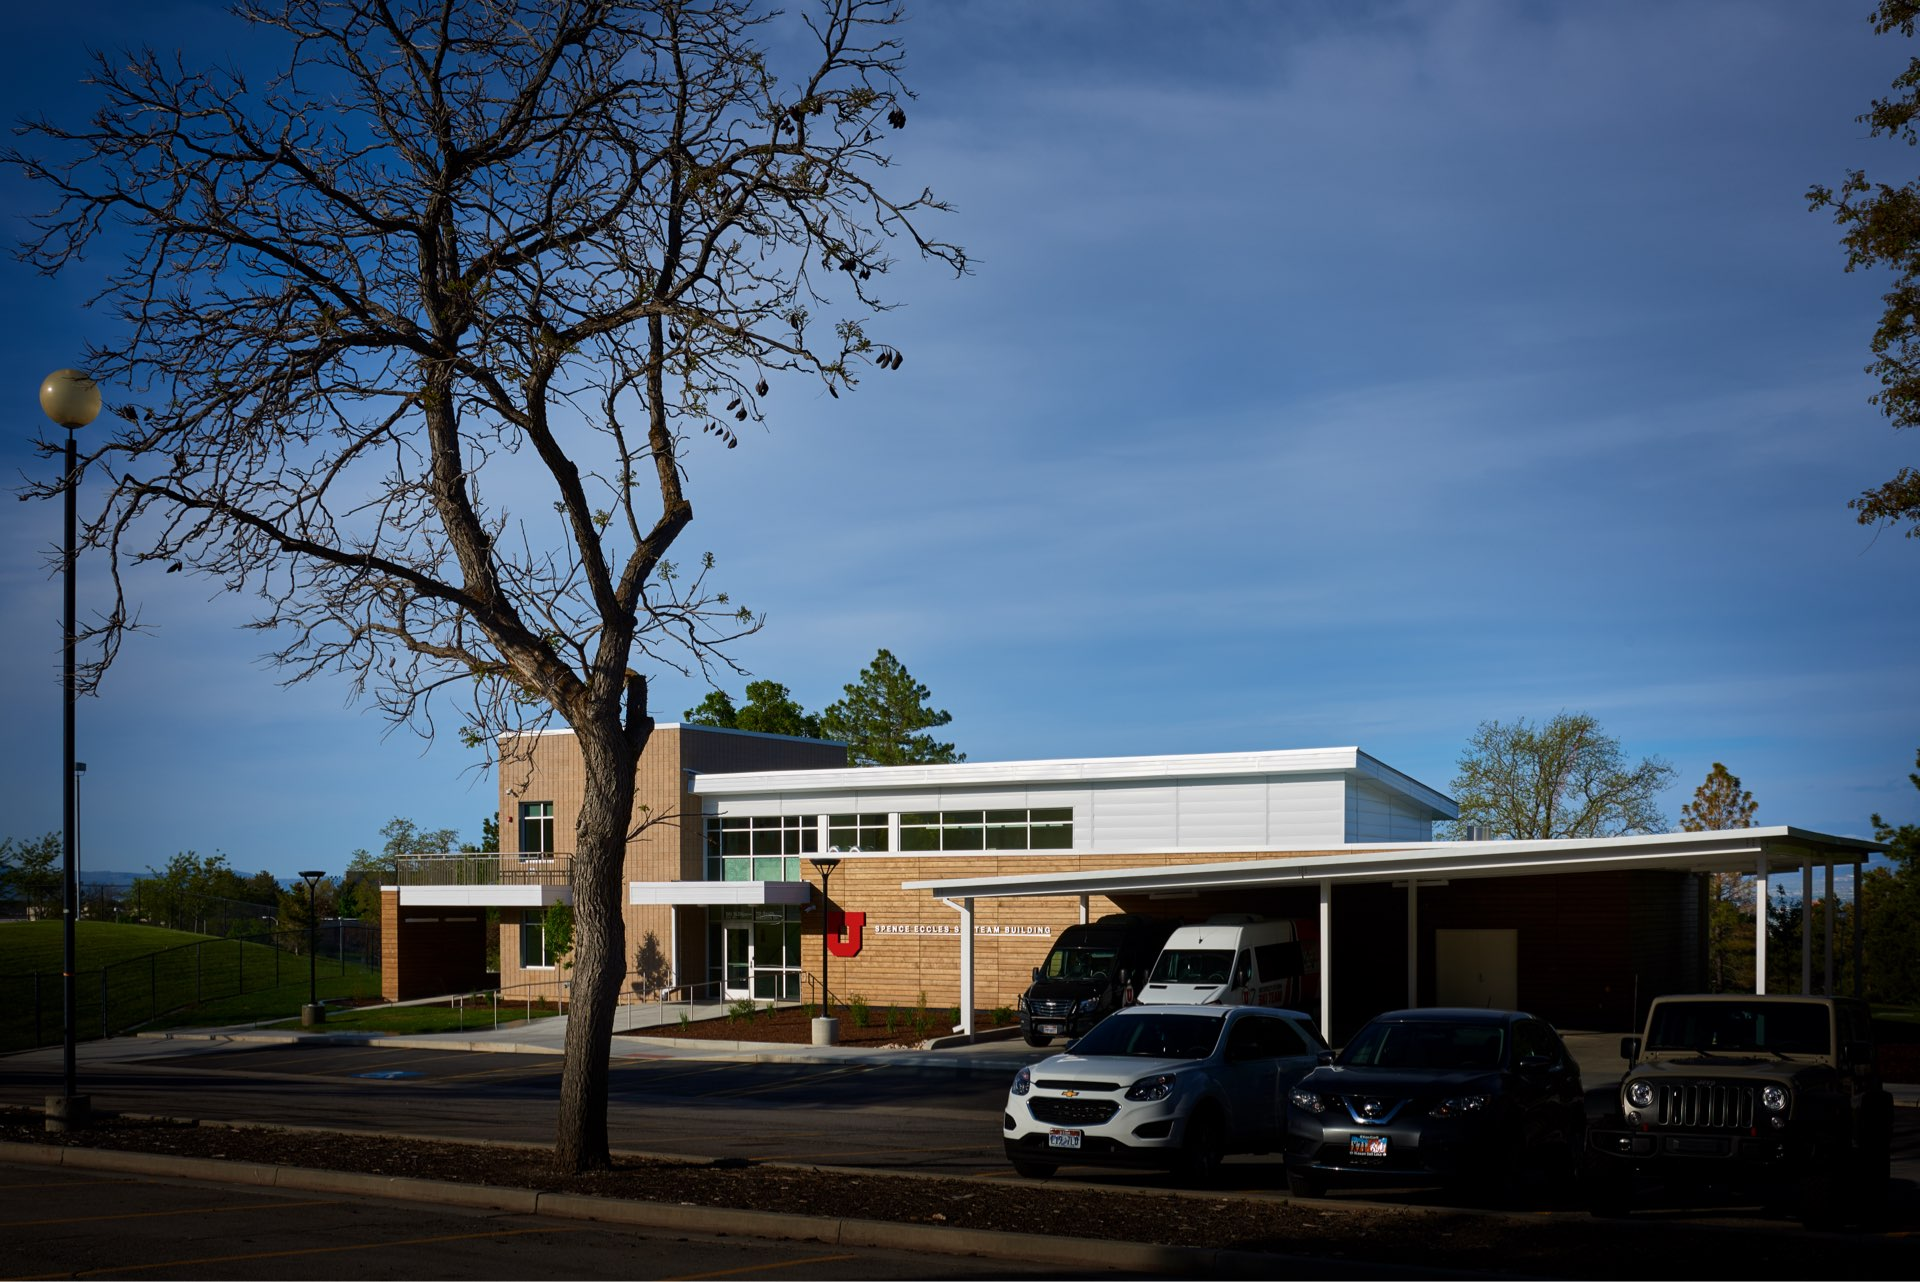 Parking, University of Utah Ski Team Building, architectural design by Elliott Workgroup